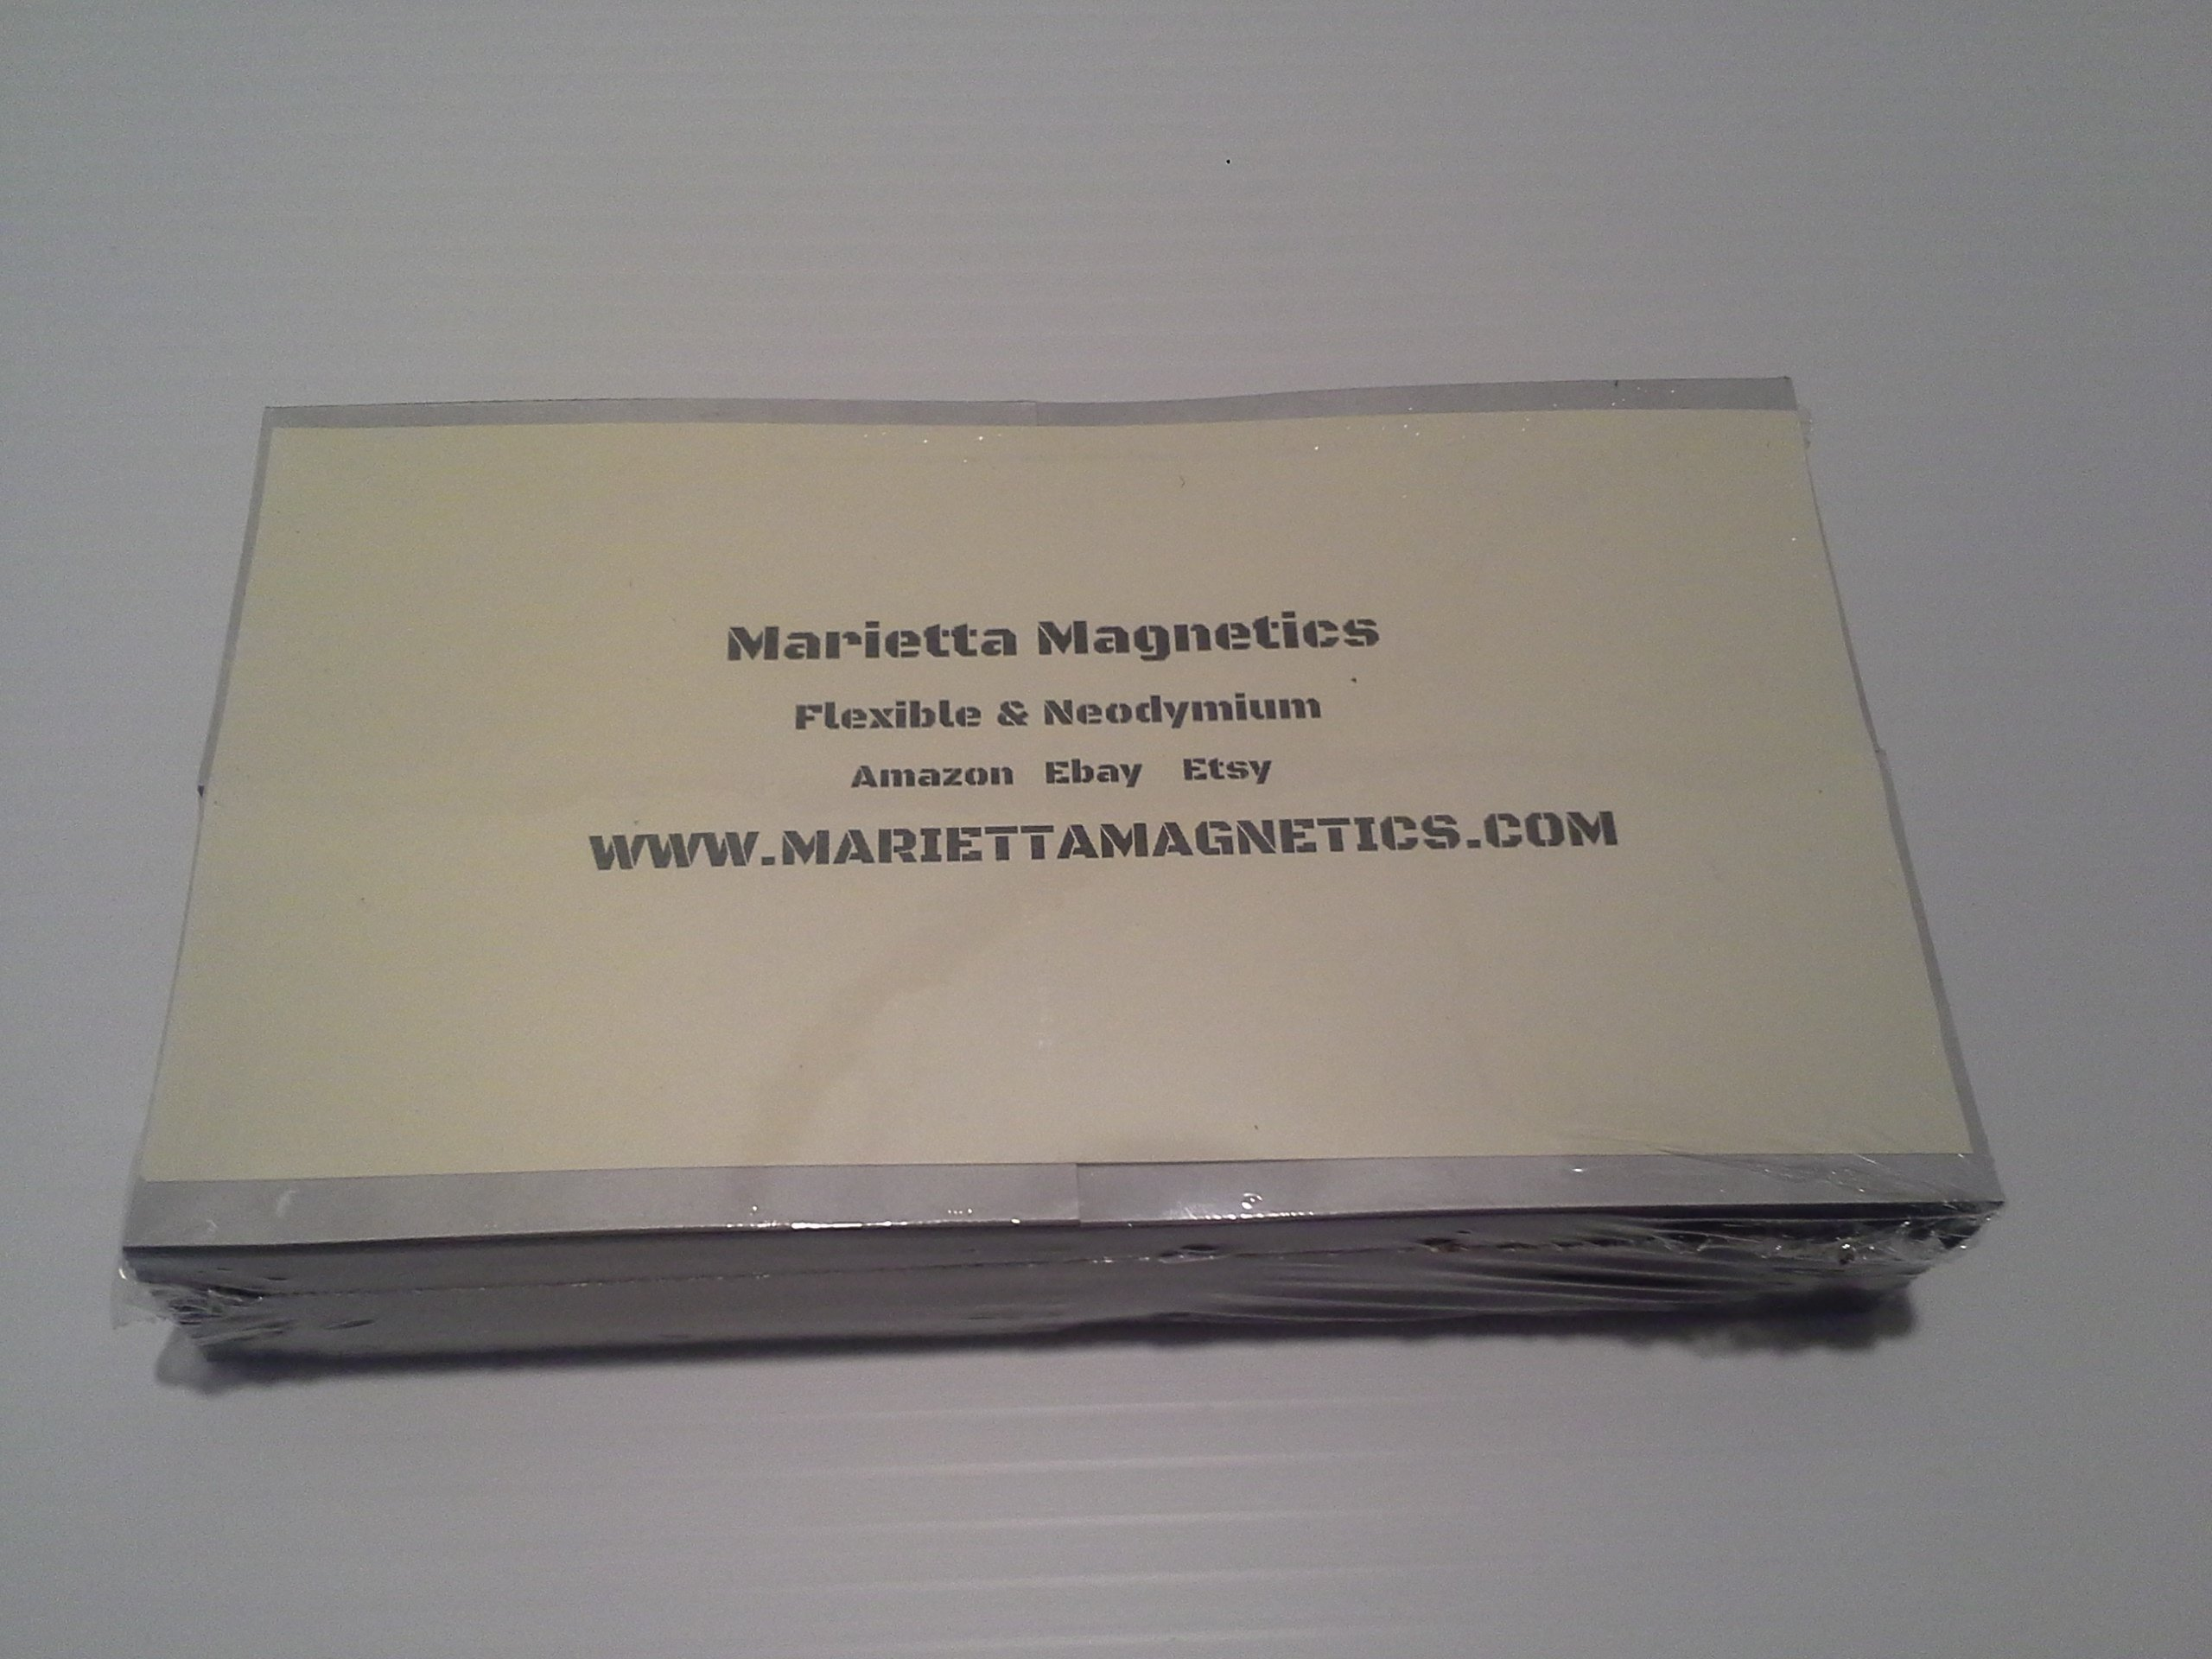 Marietta Magnetics - Self Adhesive Business Card Magnets 250pc